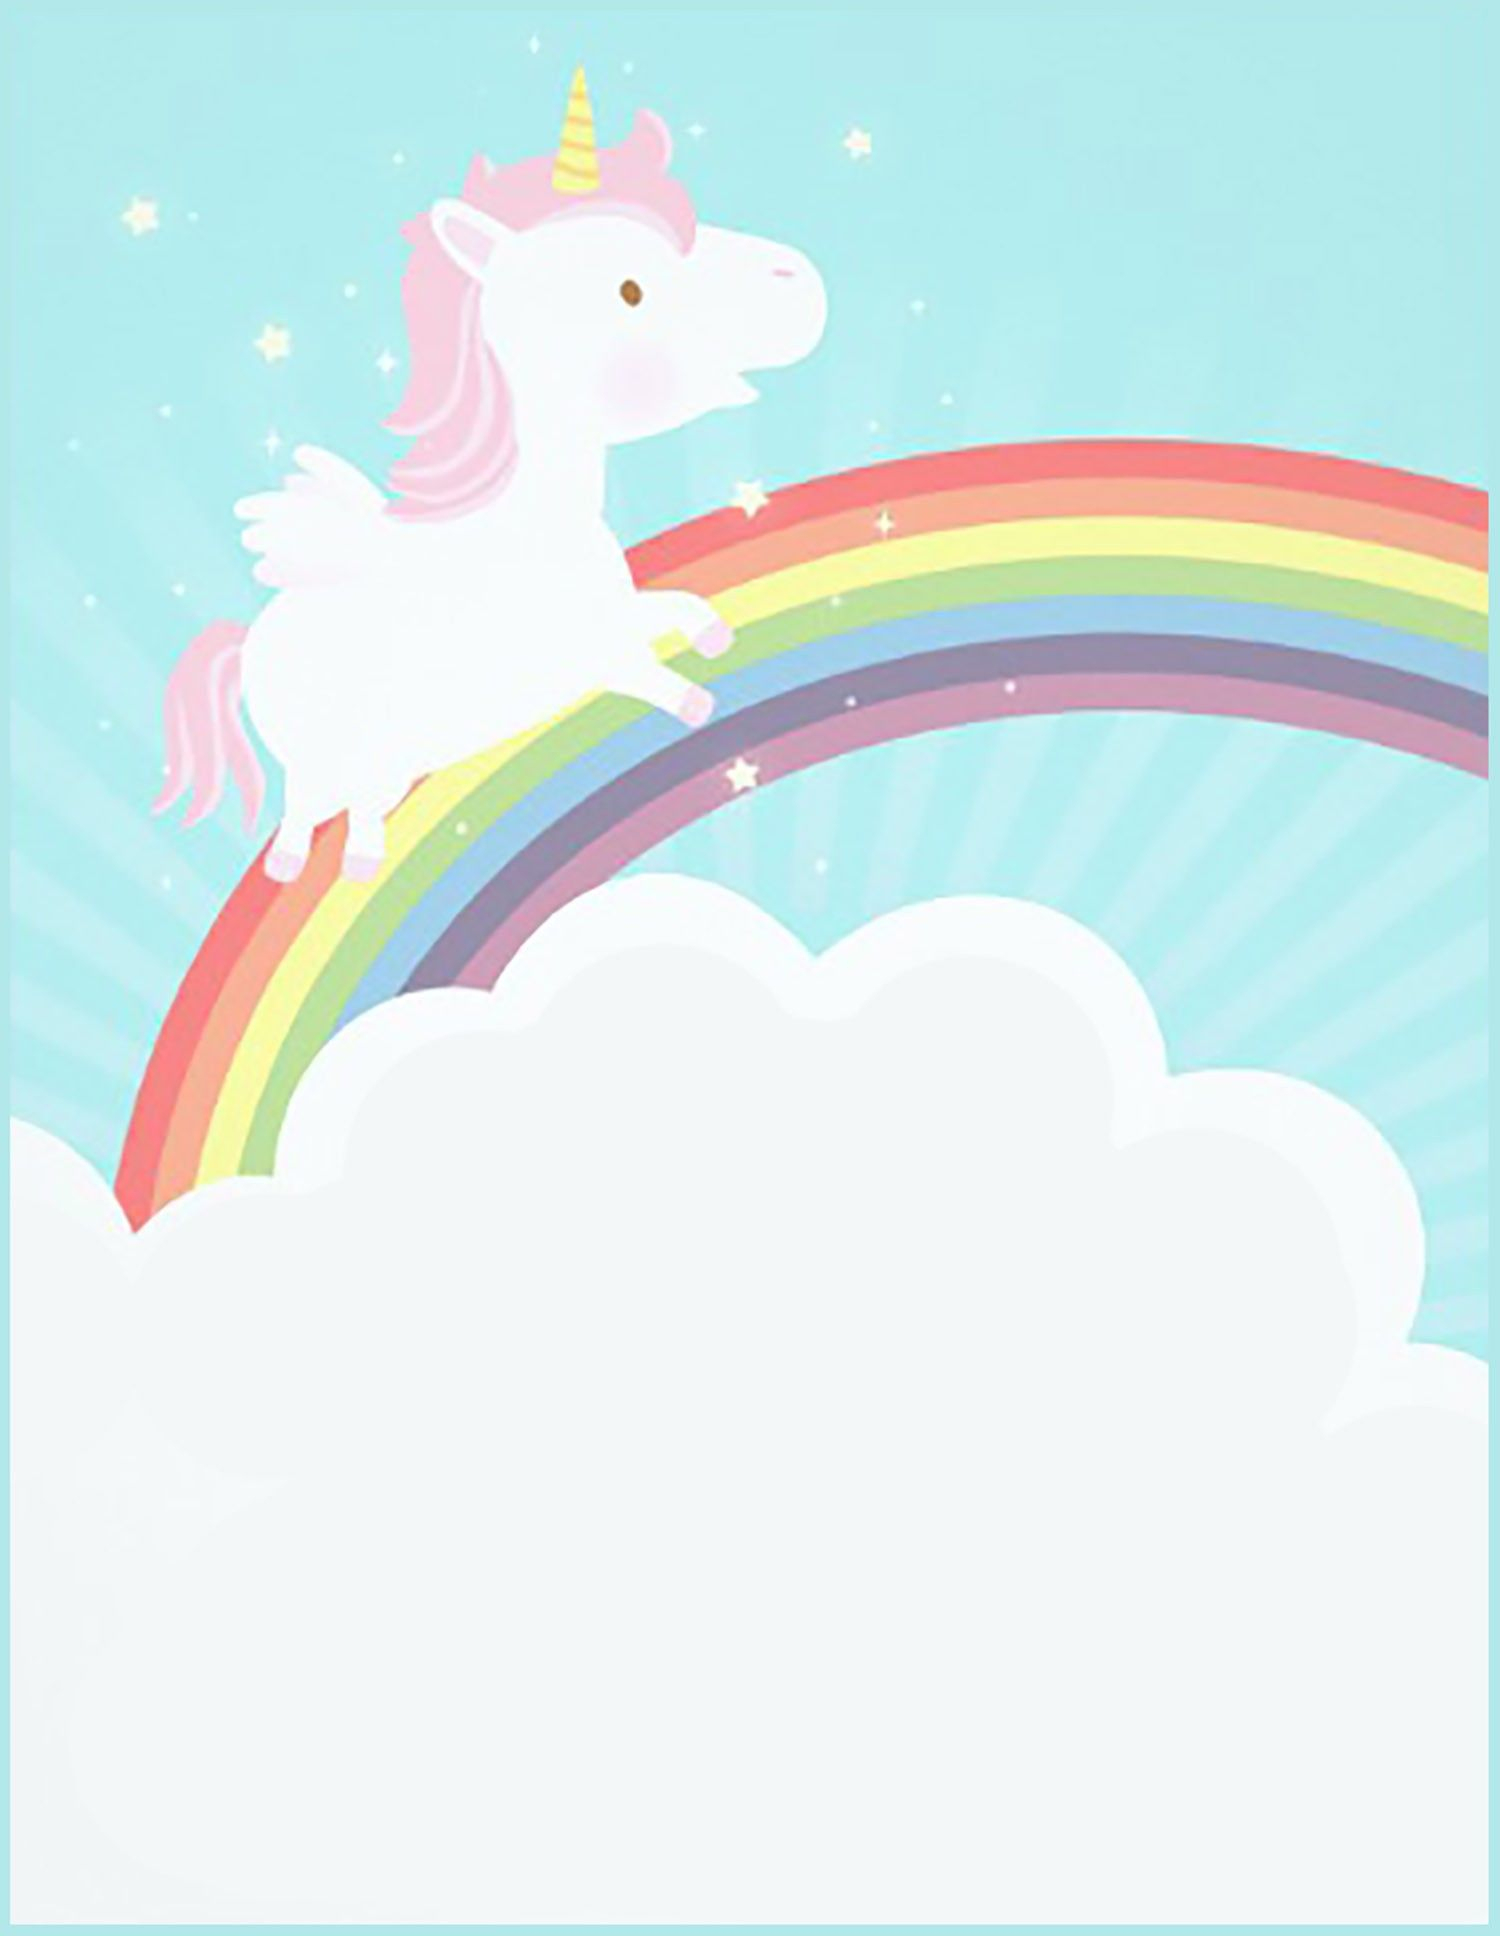 Free Printable Unicorn Invitation Card | Unicorn | Unicorn - Free Printable Unicorn Invitations